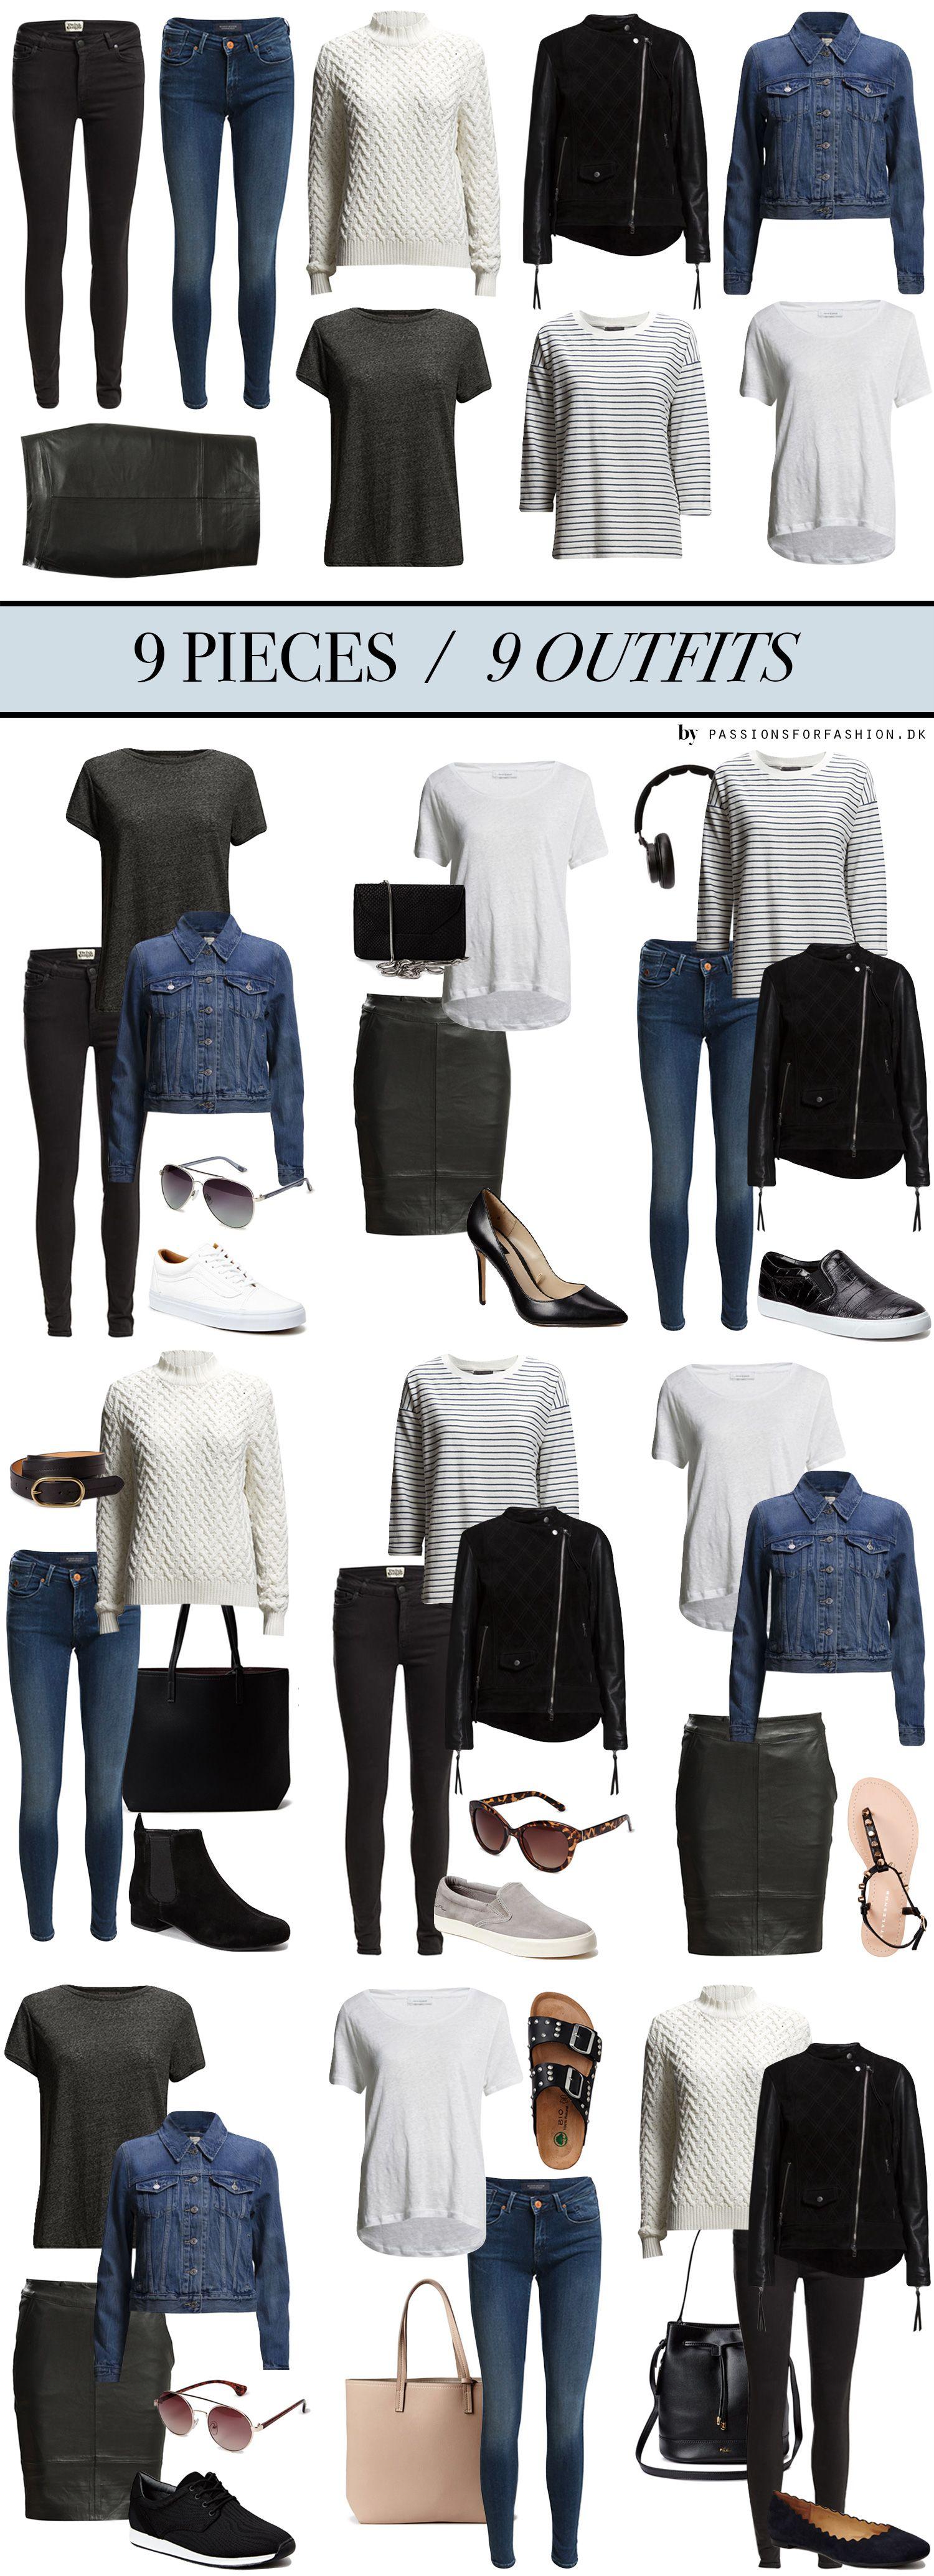 Combina moda con estas 9 piezas de ropa con passionsforfashion.dk #Outfit #Moda #CombinaTuRopa